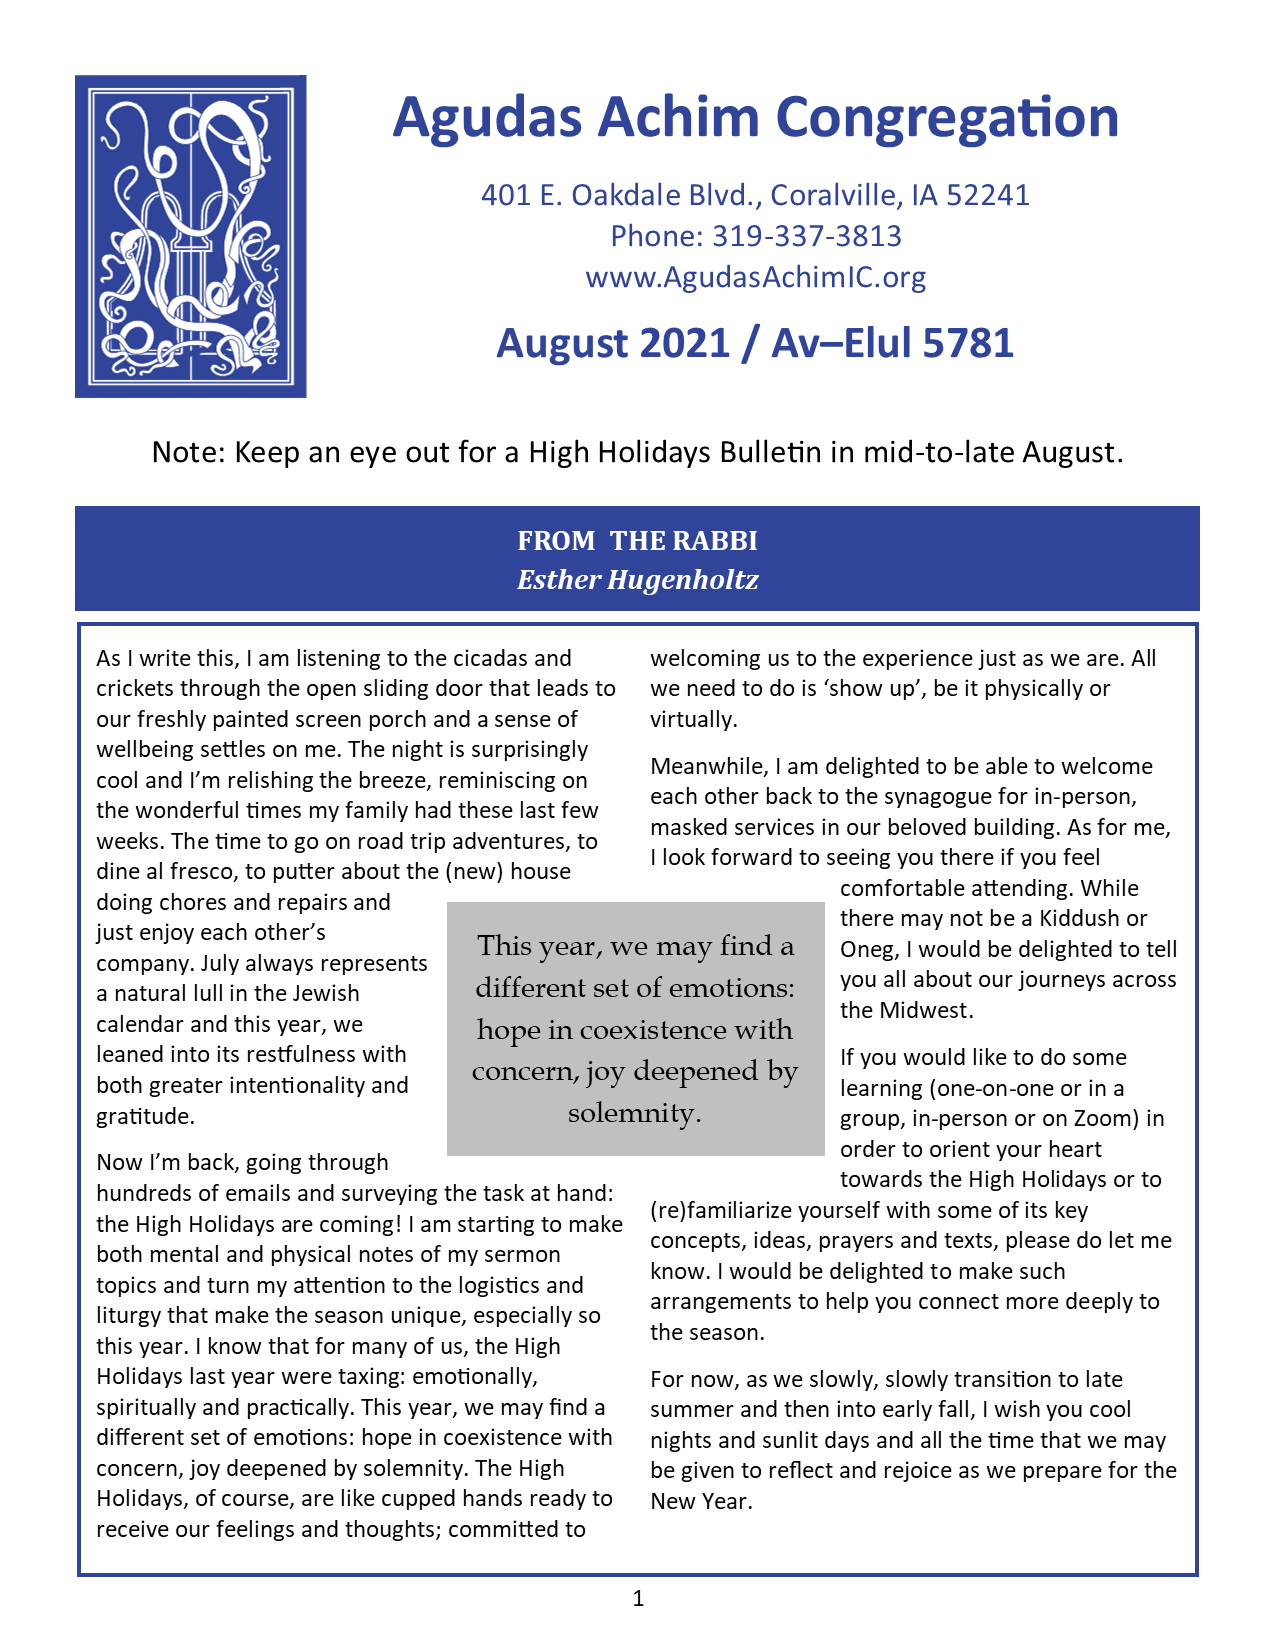 August 2021 Bulletin Cover